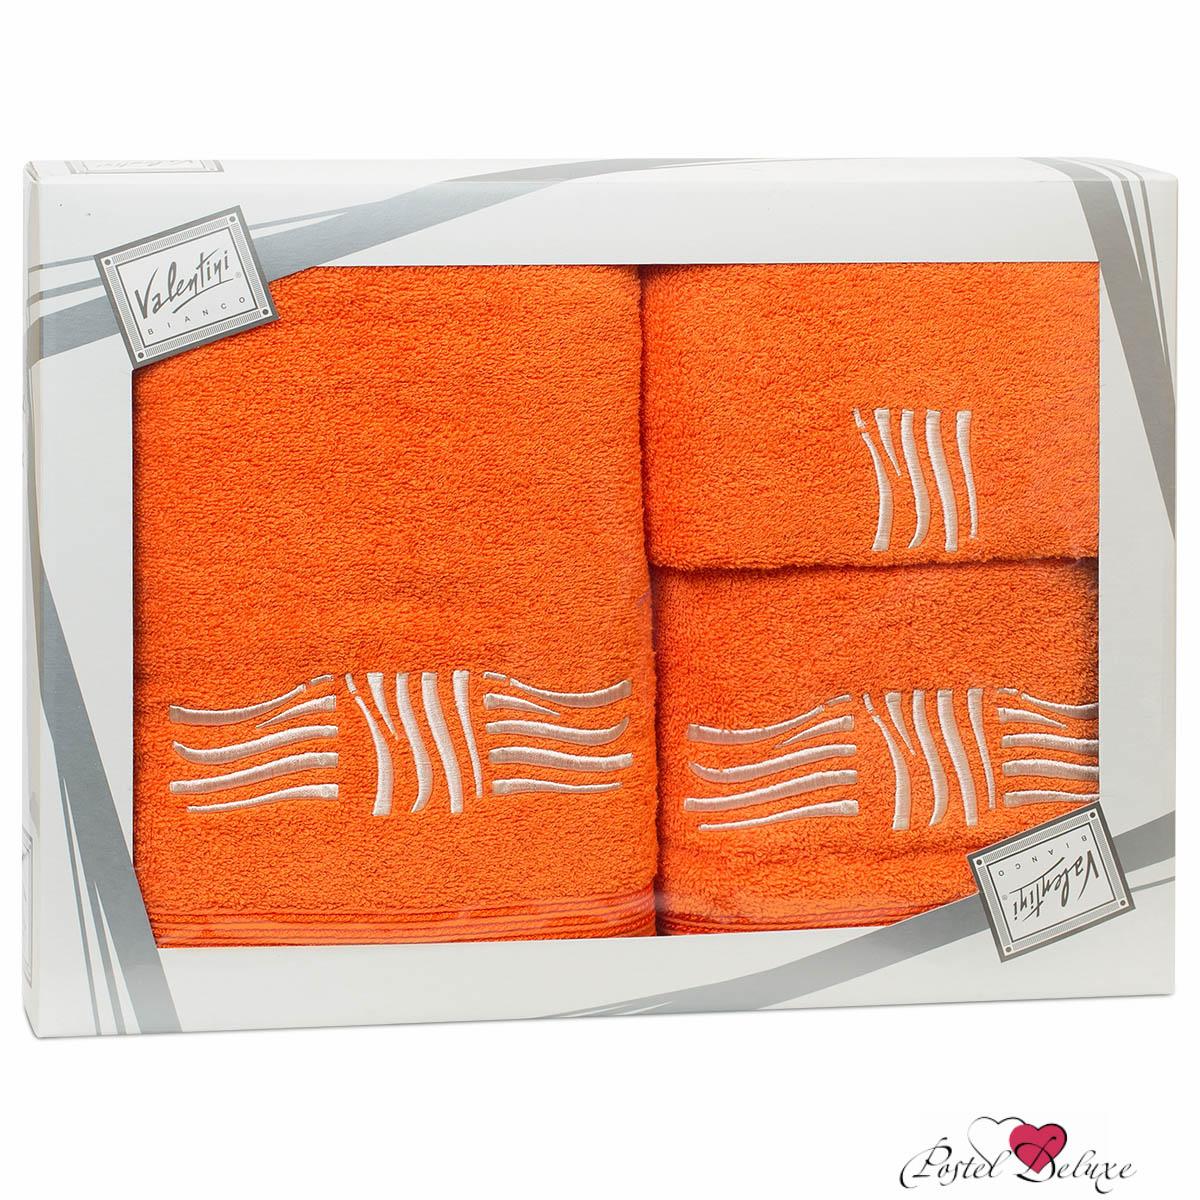 Купить Полотенца Valentini, Полотенце Sea Цвет: Оранжевый (Набор), Португалия, Махра